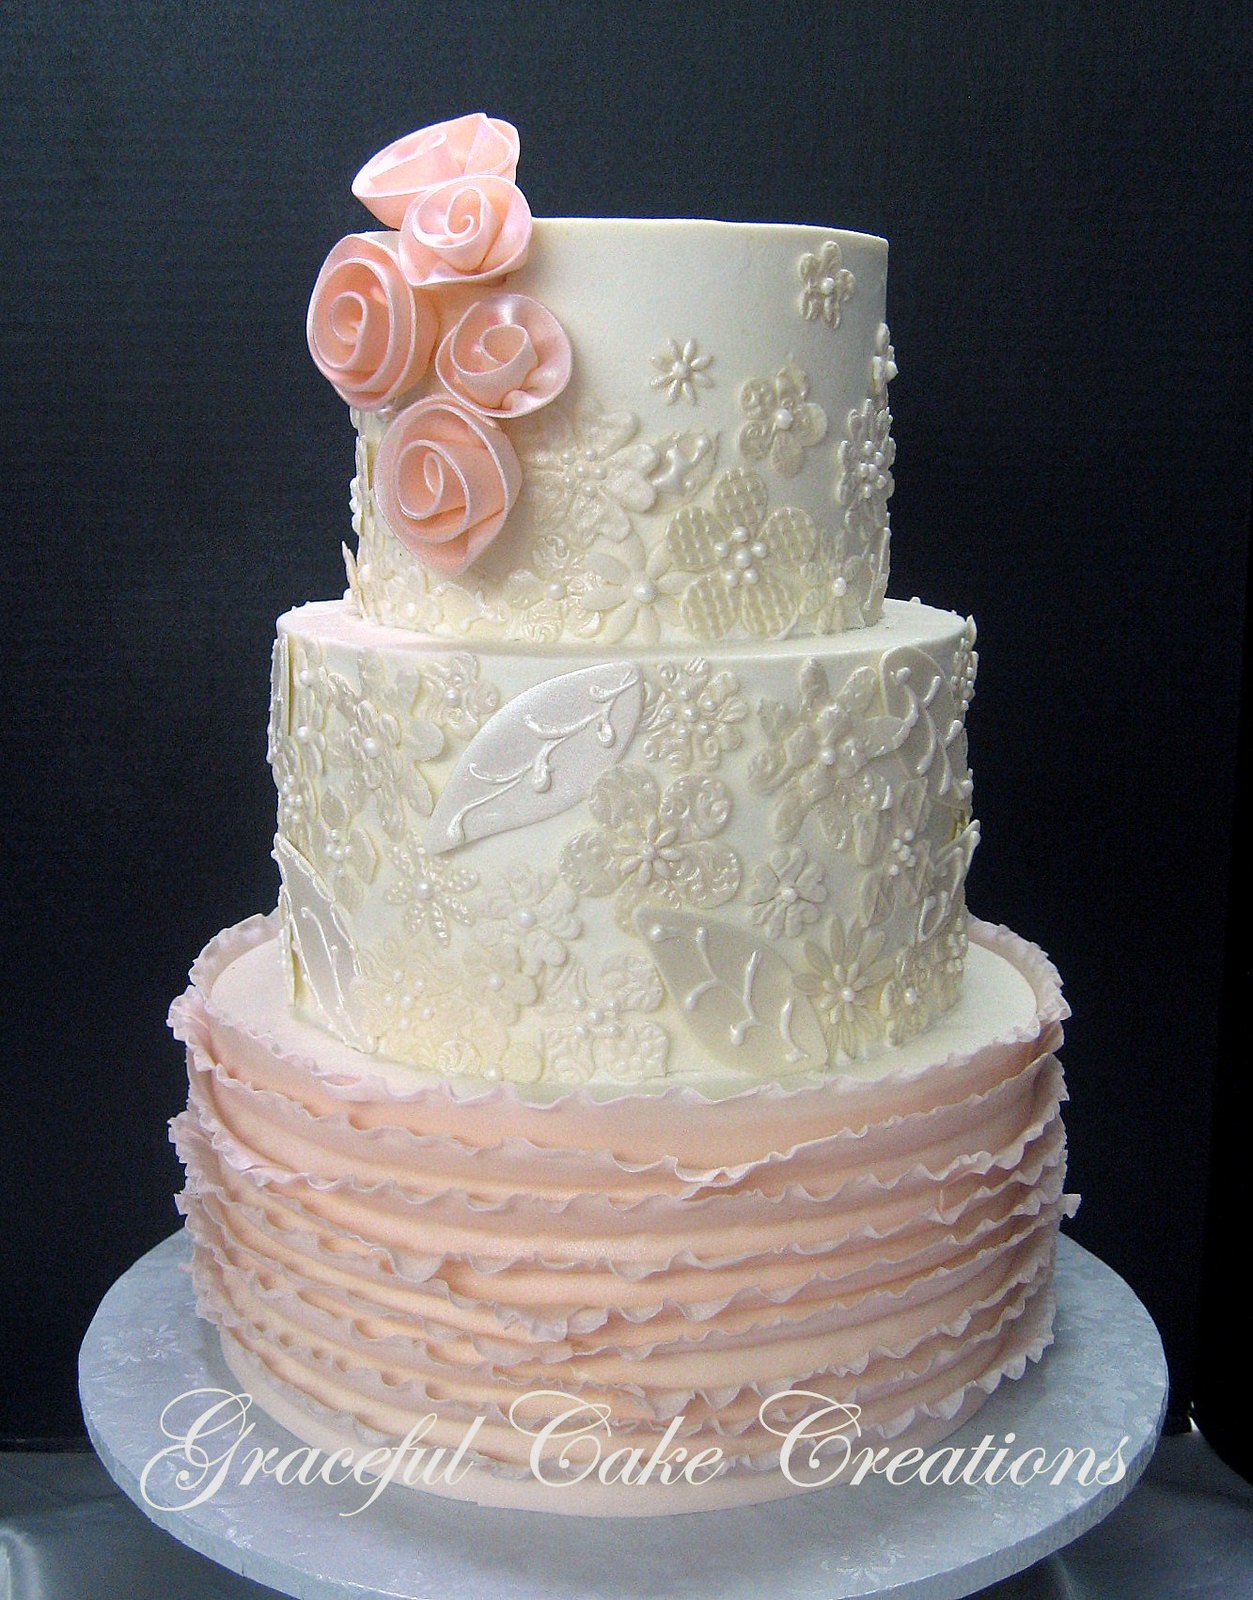 Elegant Ivory Wedding Cake with Fondant Lace Applique and